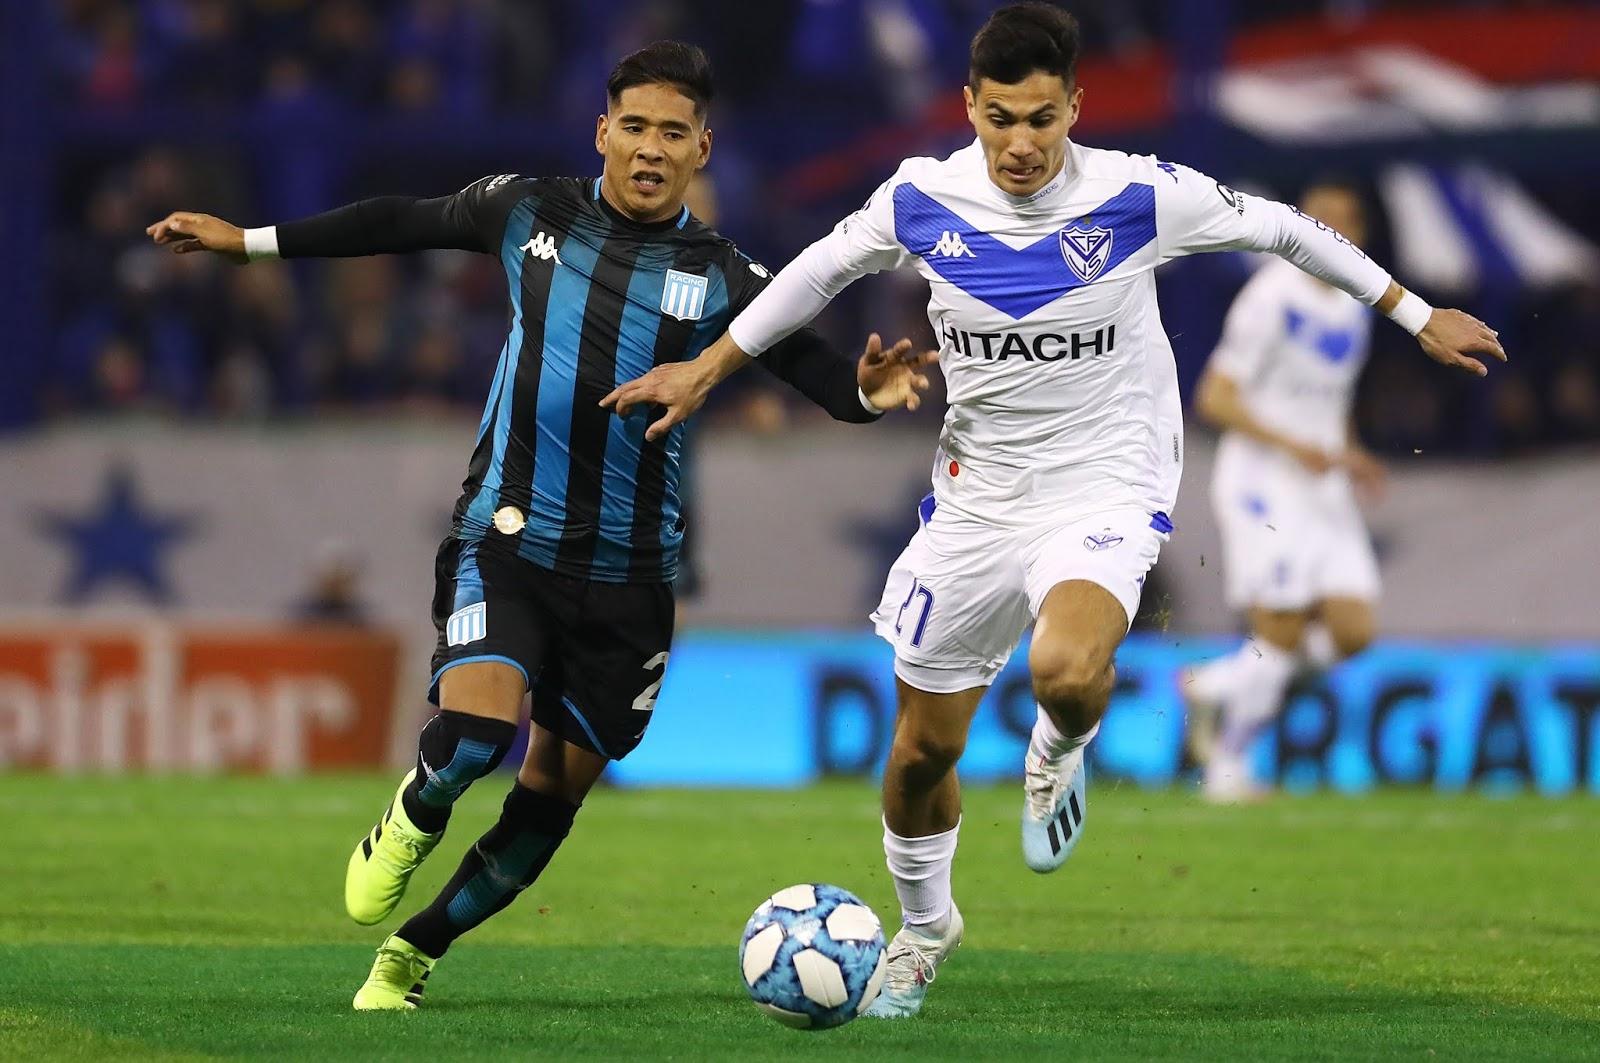 Velez 2-2 Racing - Fecha 2 - Superliga Argentina